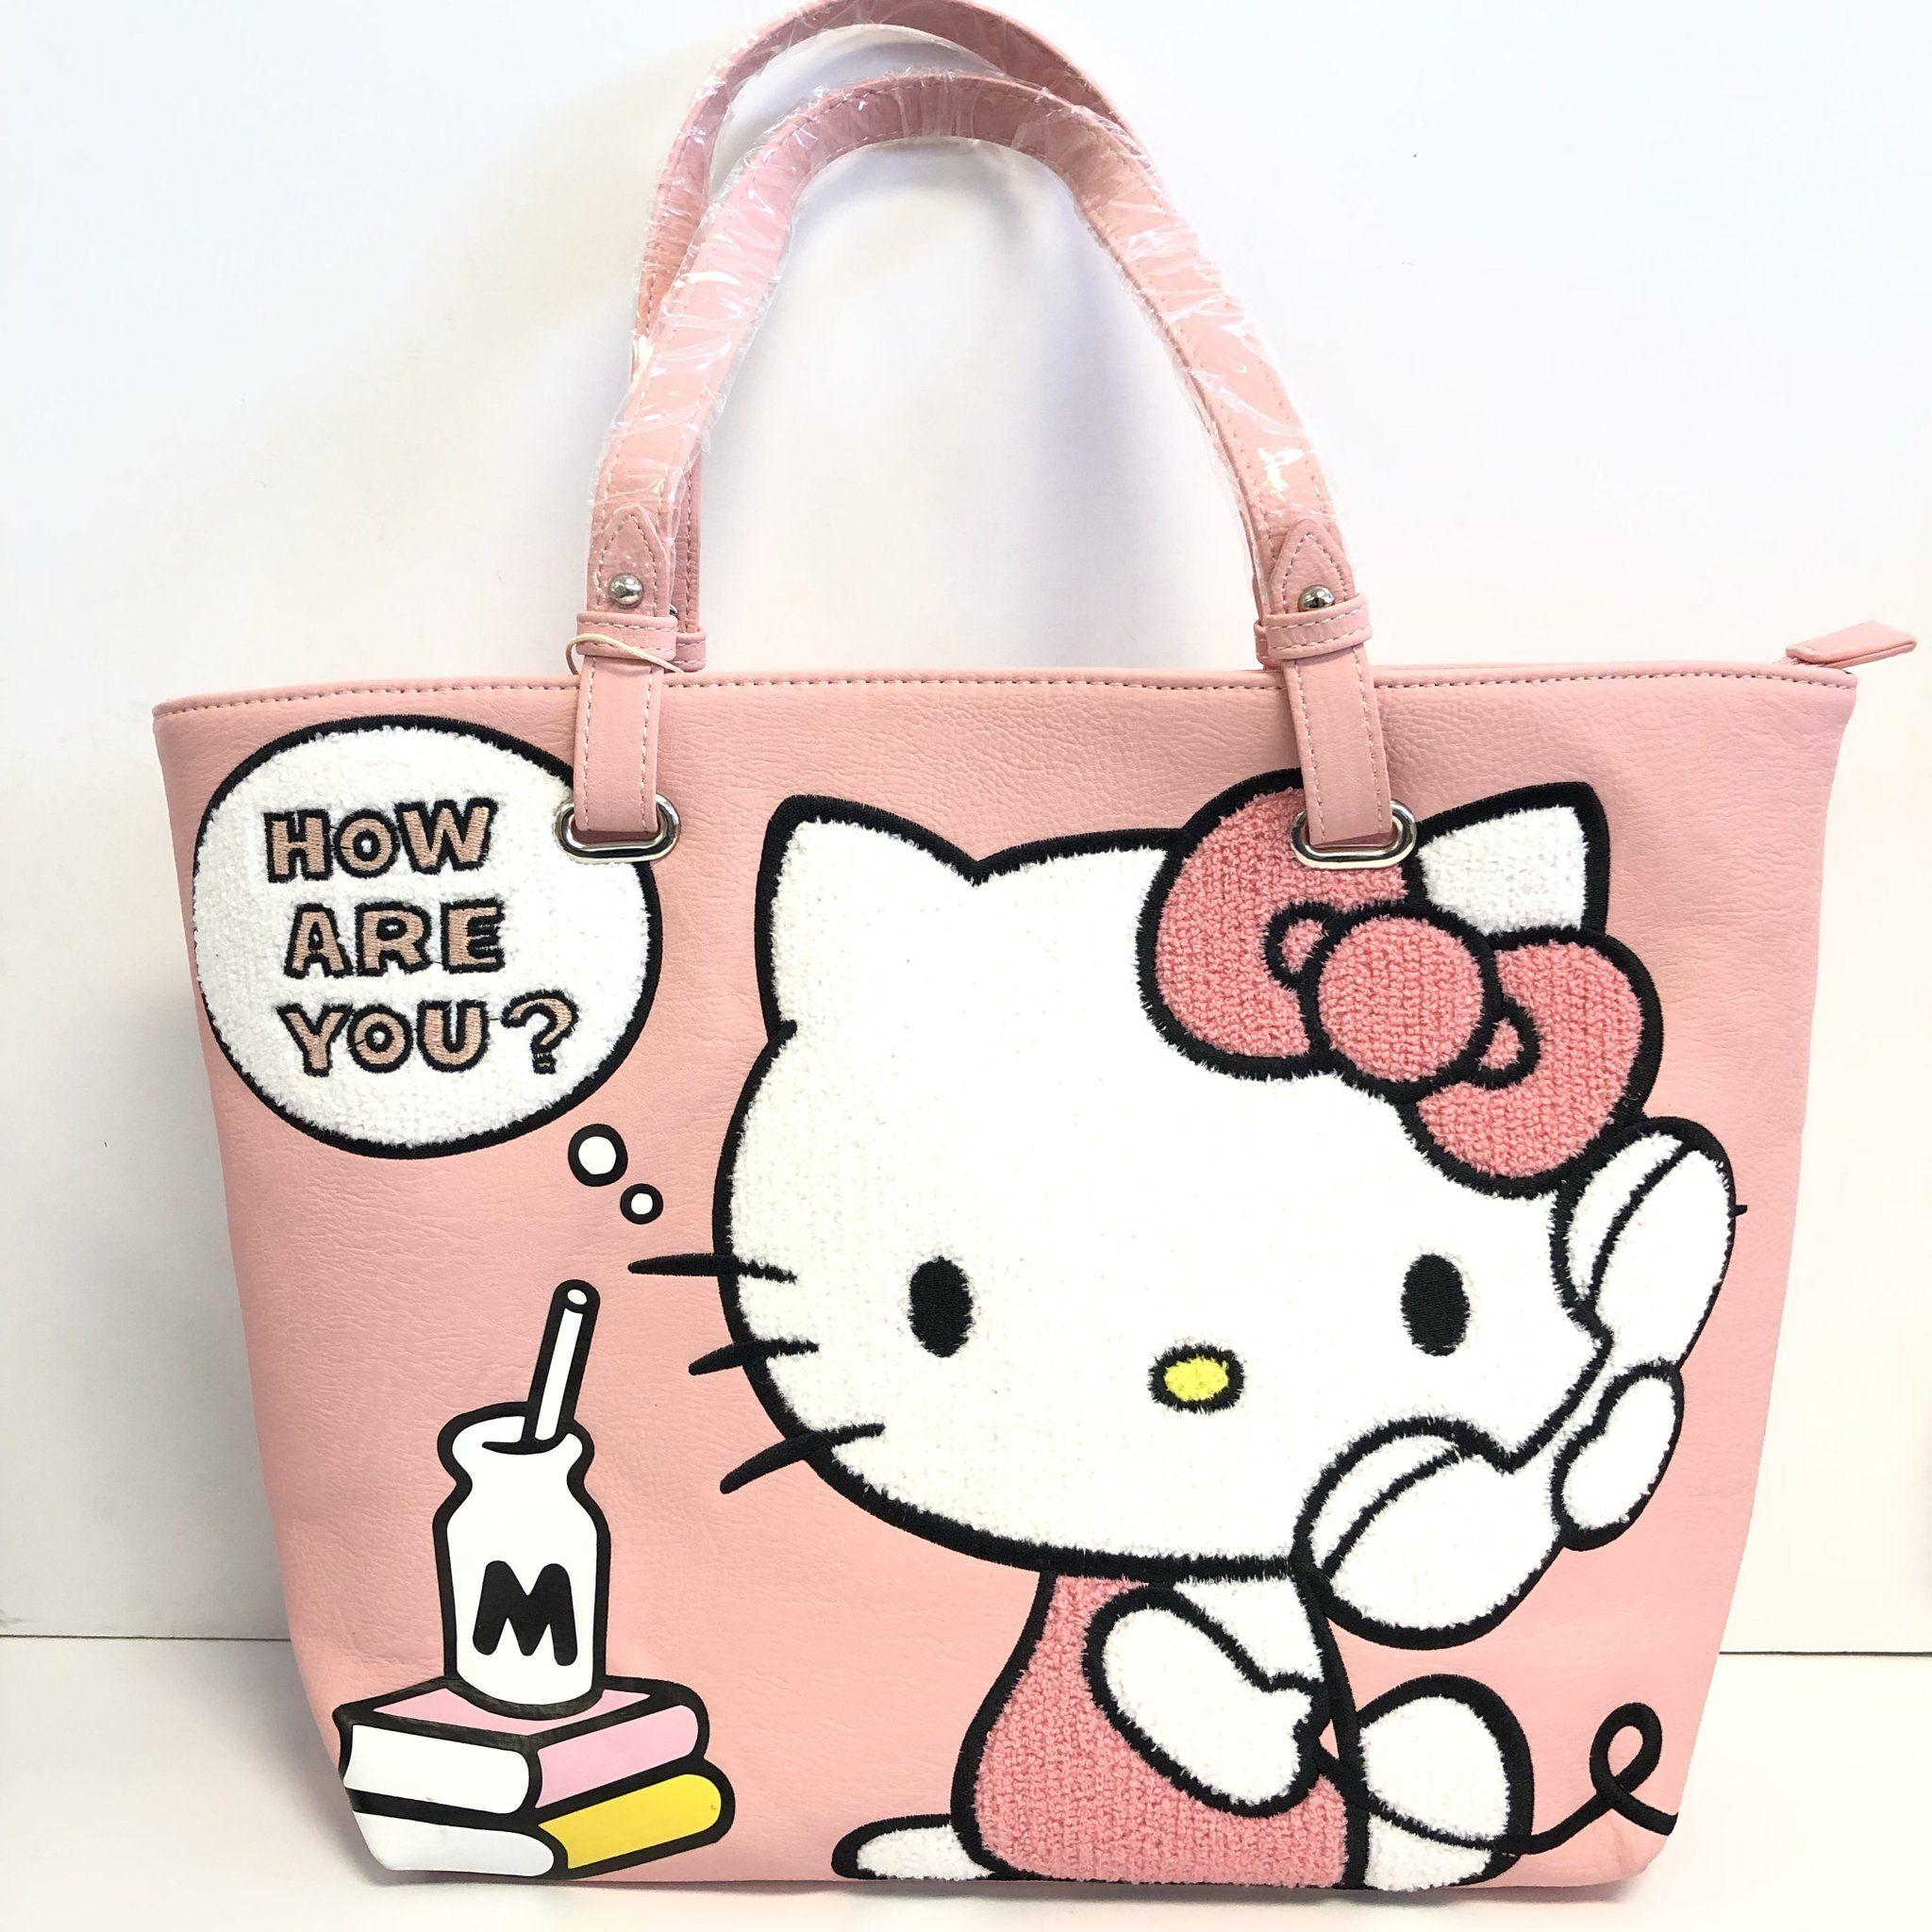 6ccacba5e Hello Kitty Telephone Tote by Loungefly | Sanrio Totes | Hello kitty ...